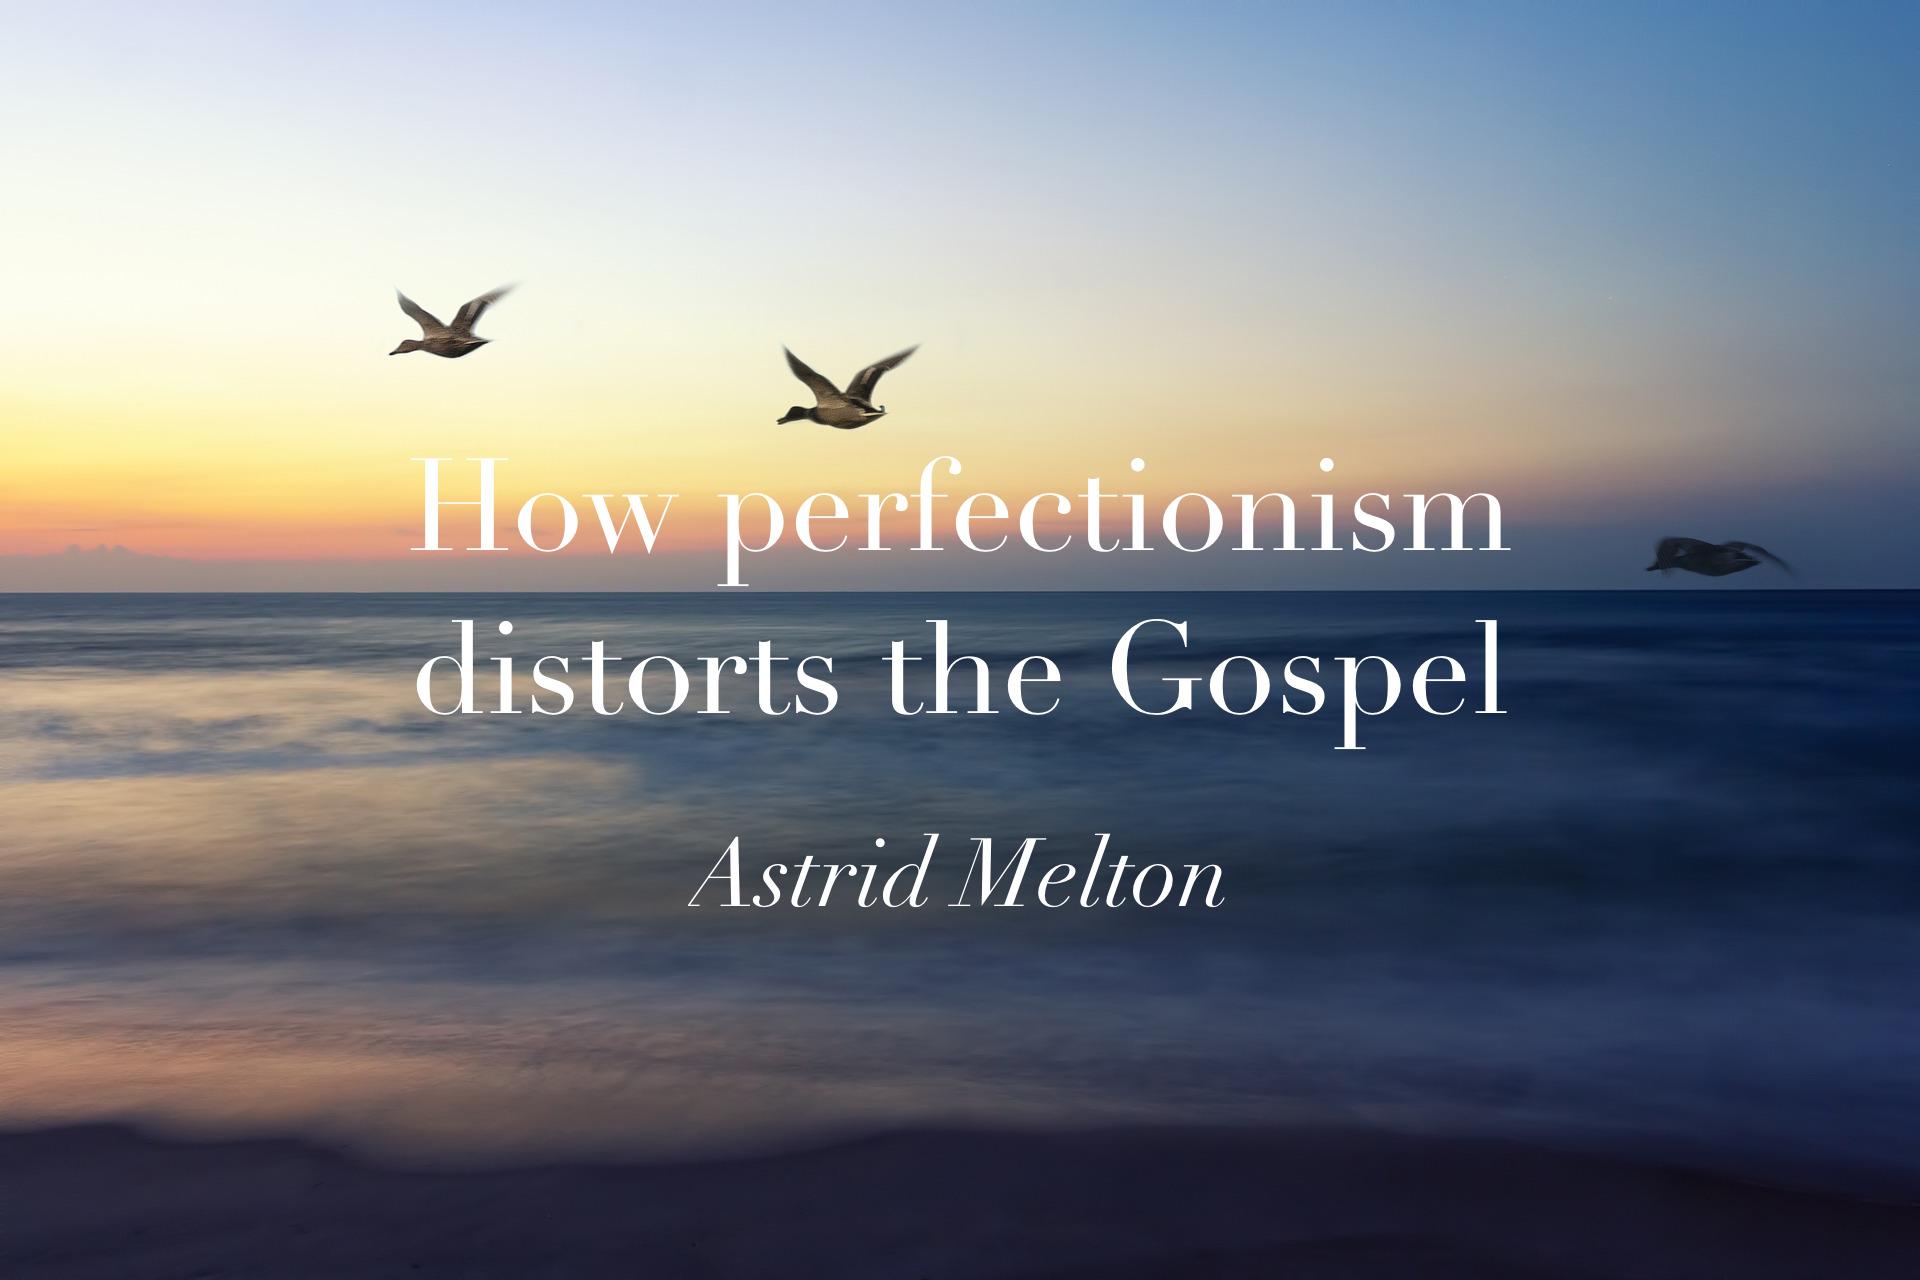 Astrid Melton post